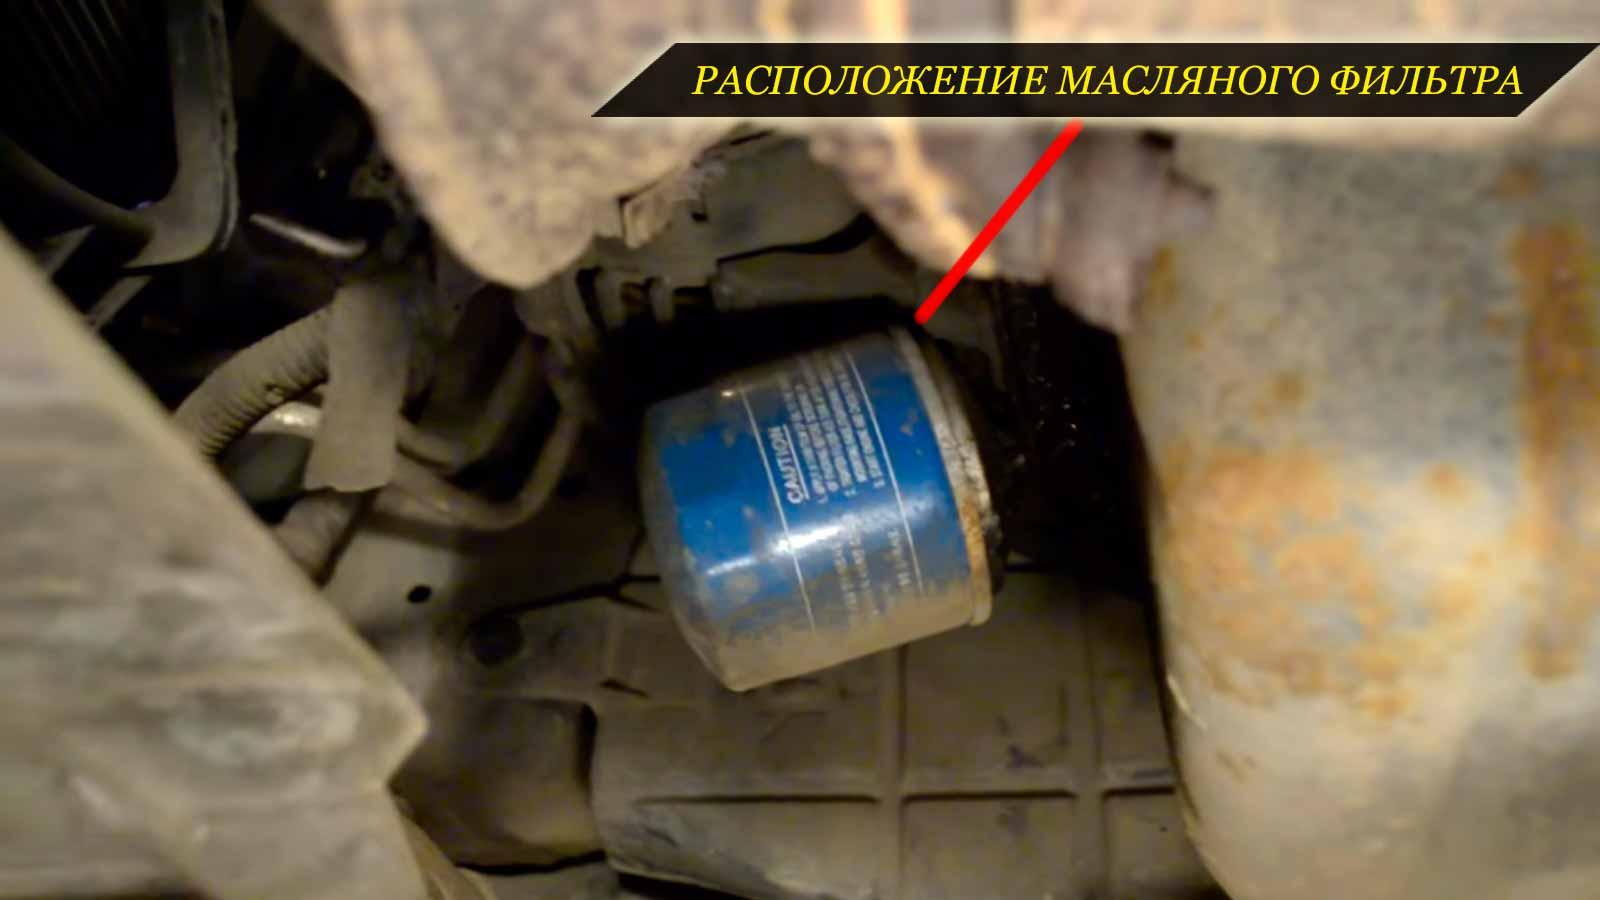 Замена масла в 8-ми клапанном двигателе Лада Гранта своими 24